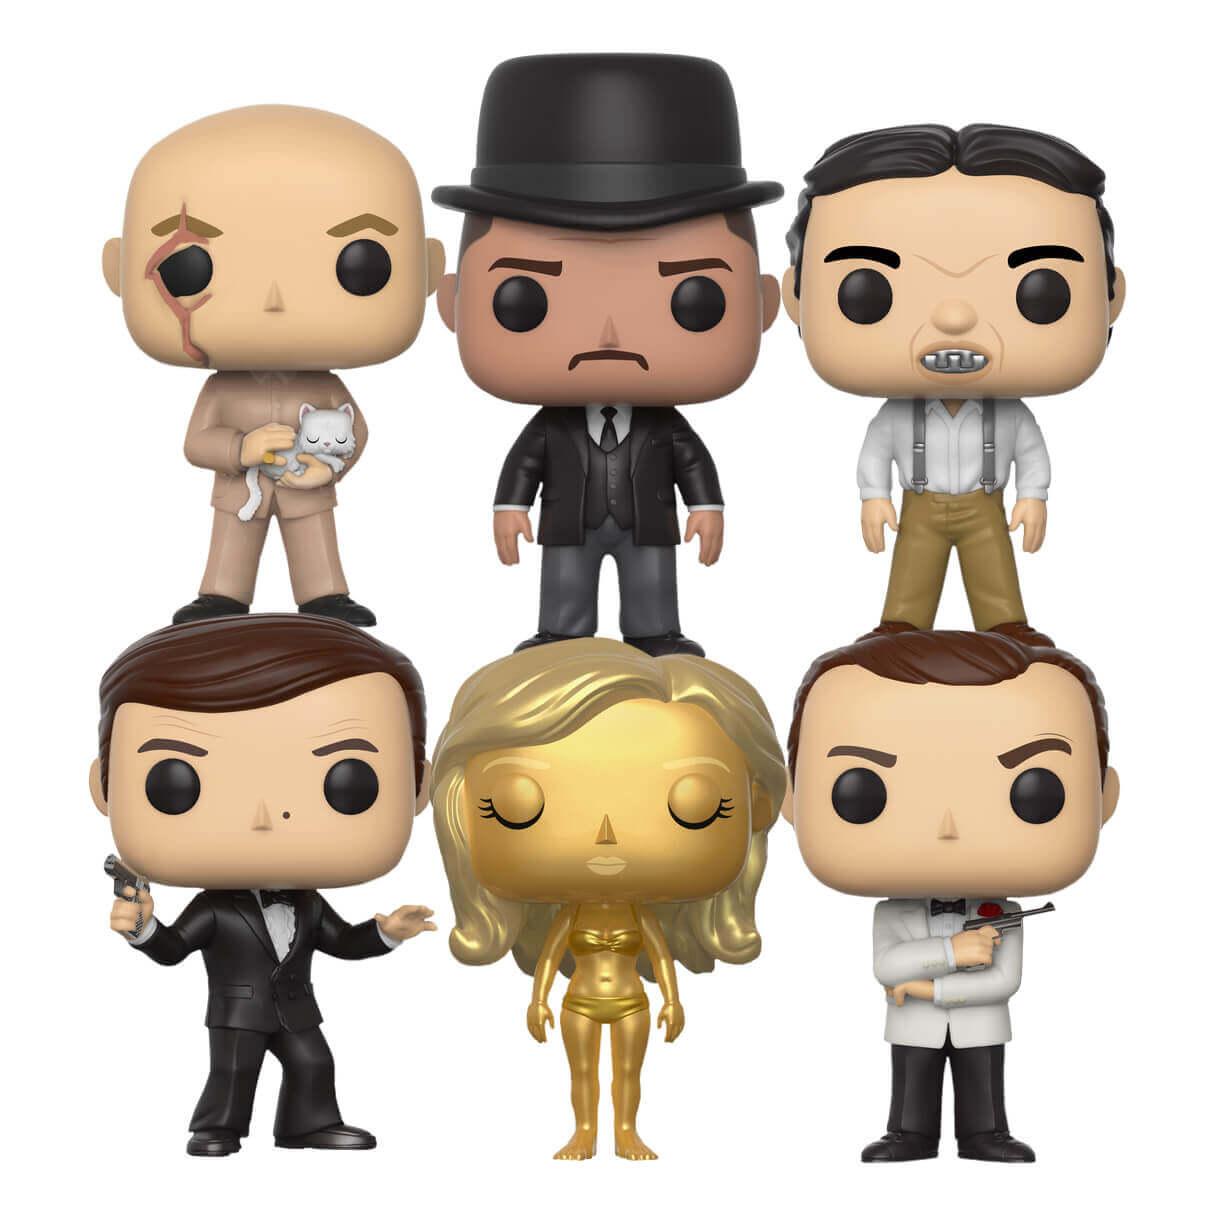 [Zavvi.de] Pop! James Bond Complete Set mit 6 Figuren portofrei mit Code